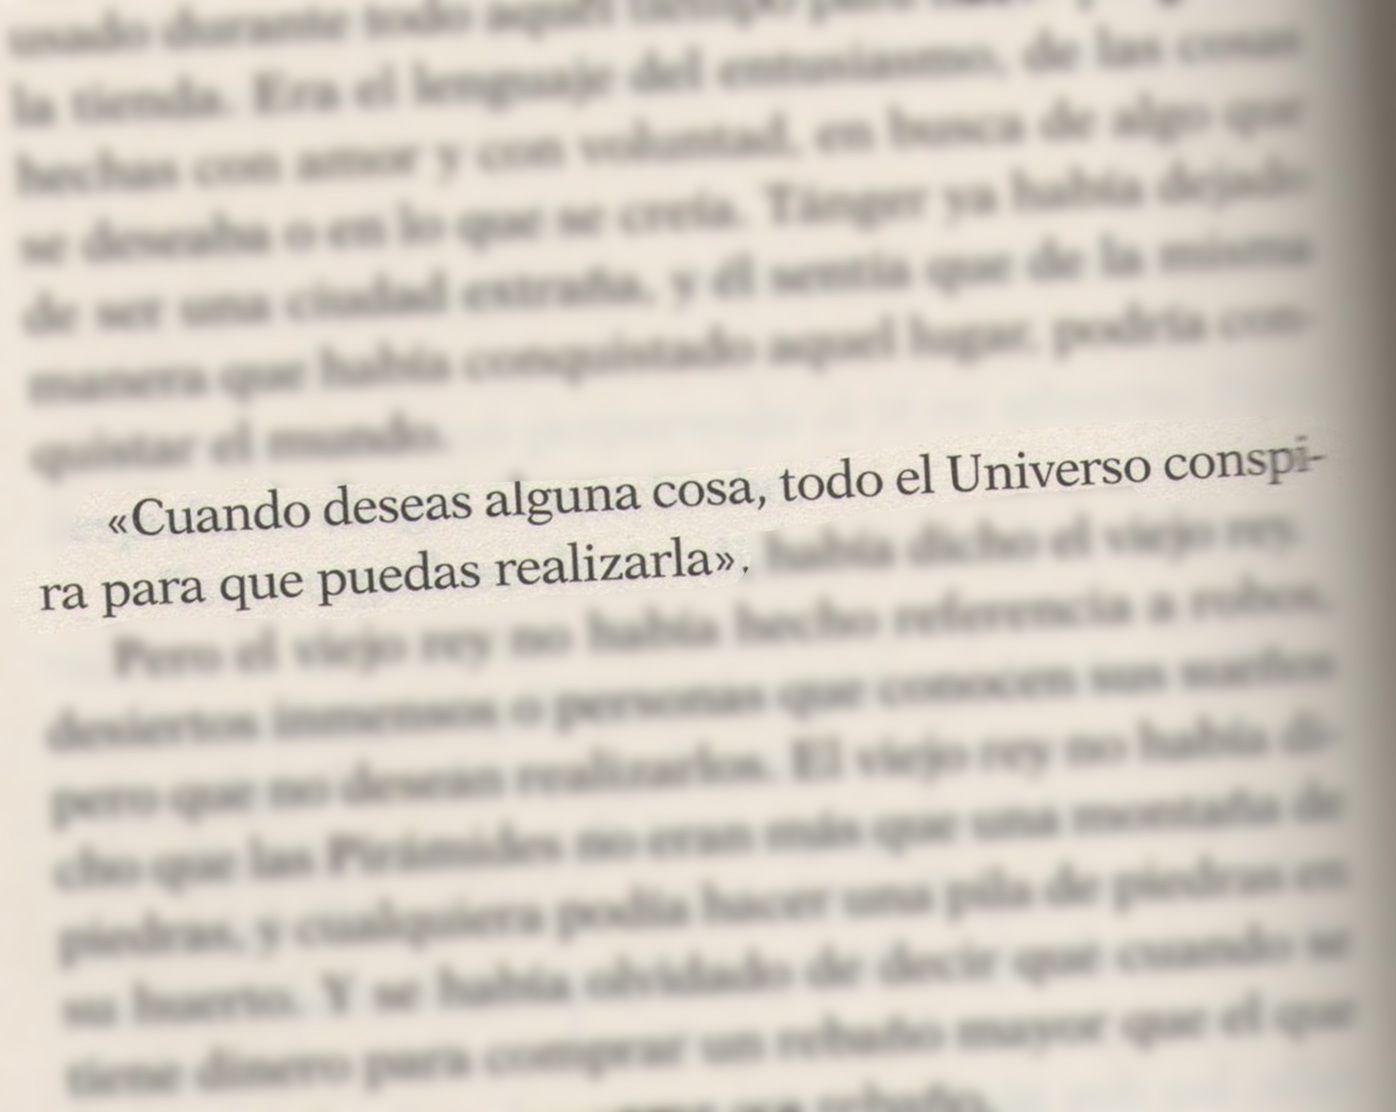 el vencedor esta solo paulo coelho books wise santiago from the alchemist el alquimista paulo coelho book